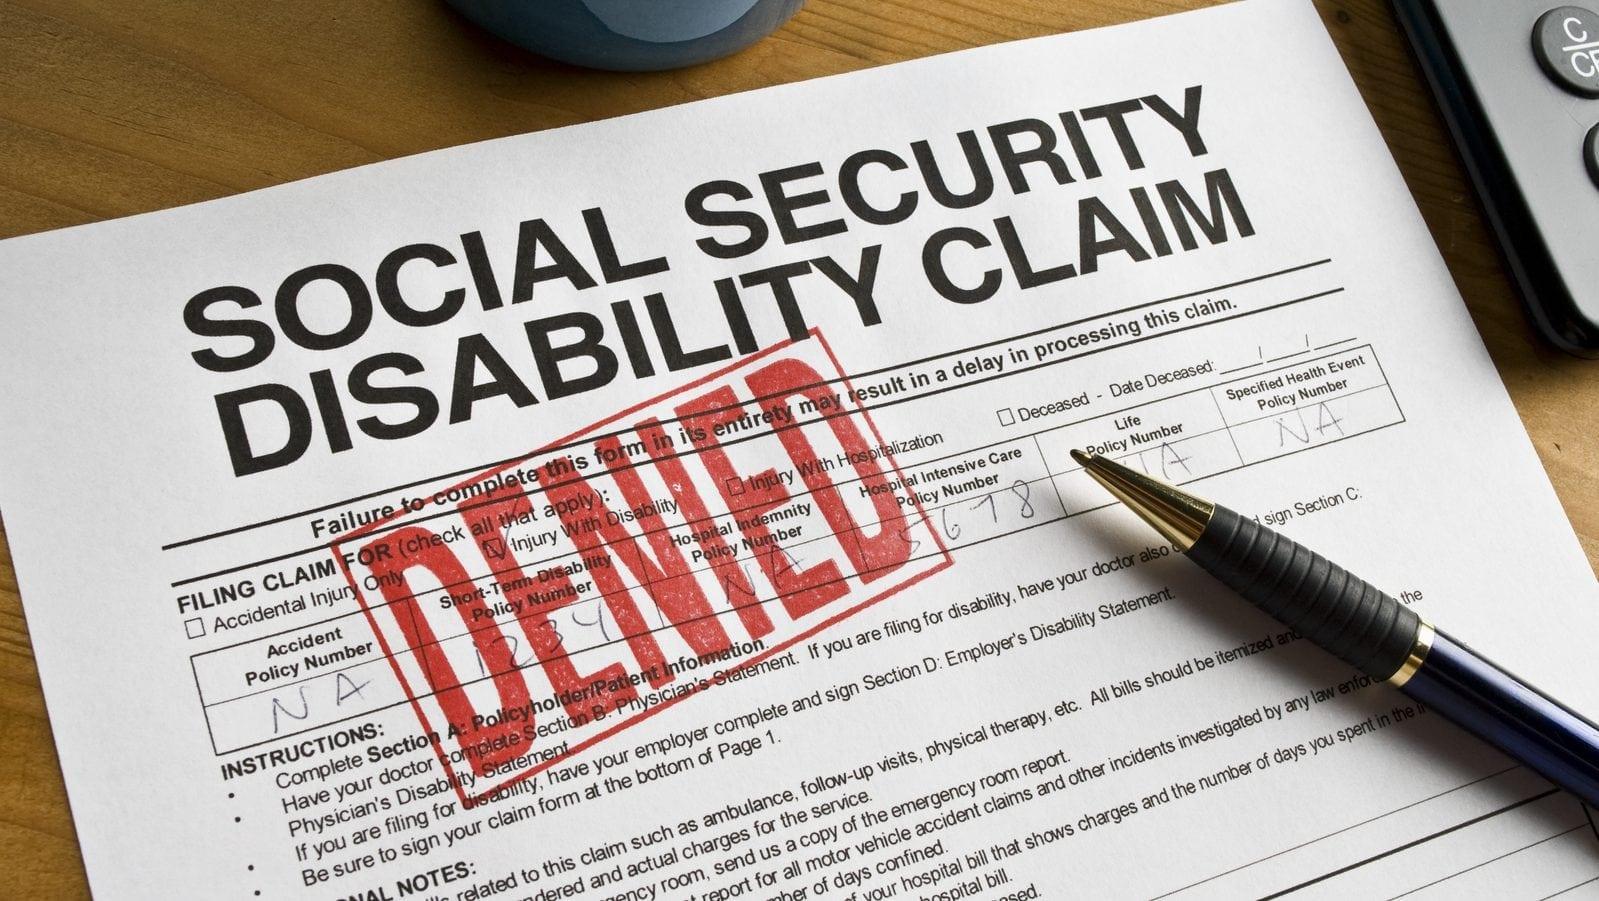 Social Security Disability Claim Denial Stock Photo